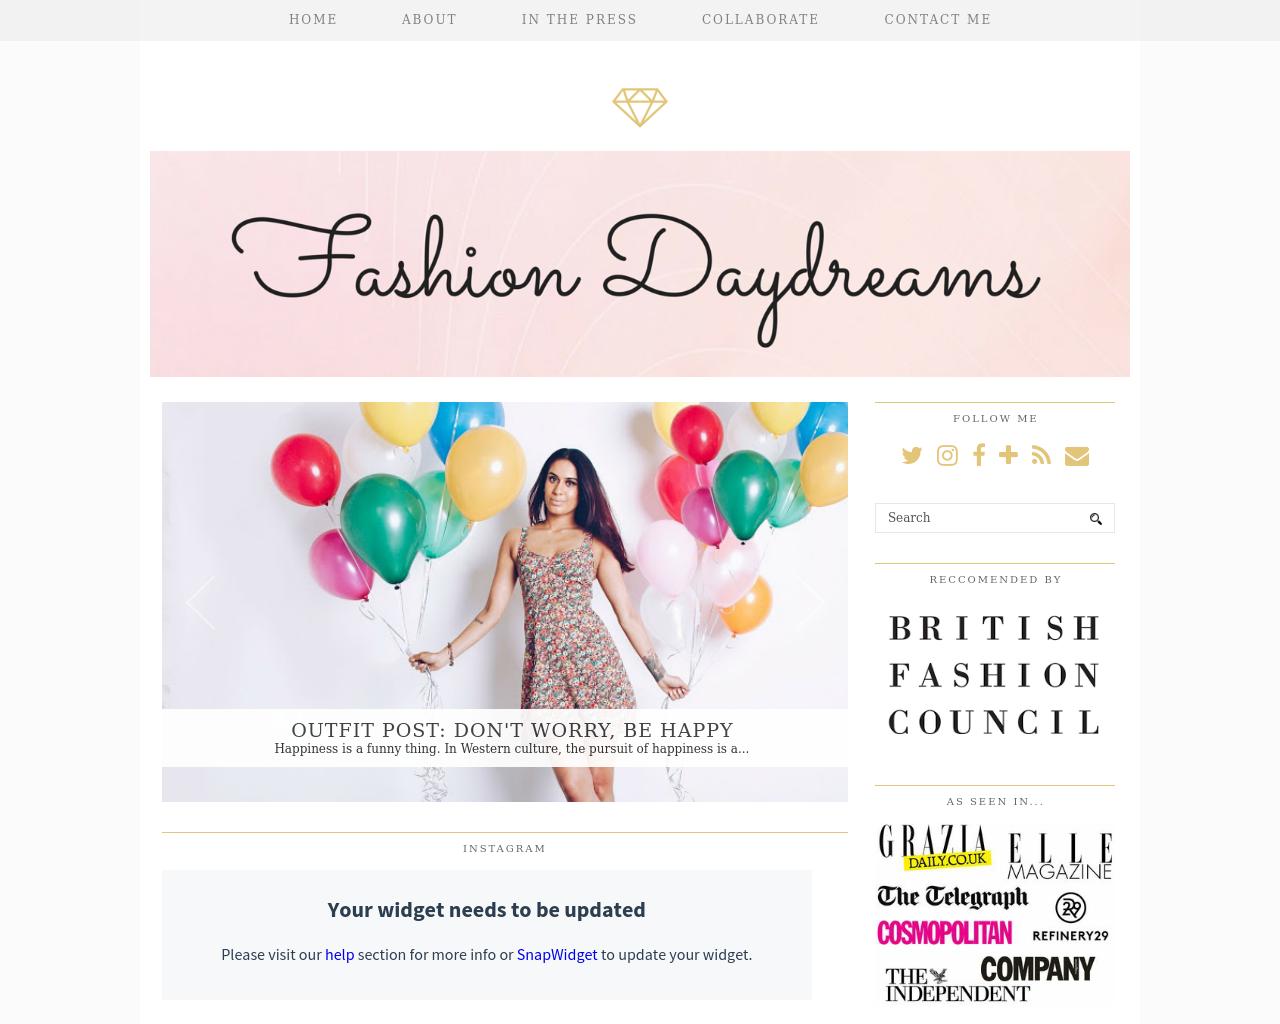 Fashion-Daydreams-Advertising-Reviews-Pricing